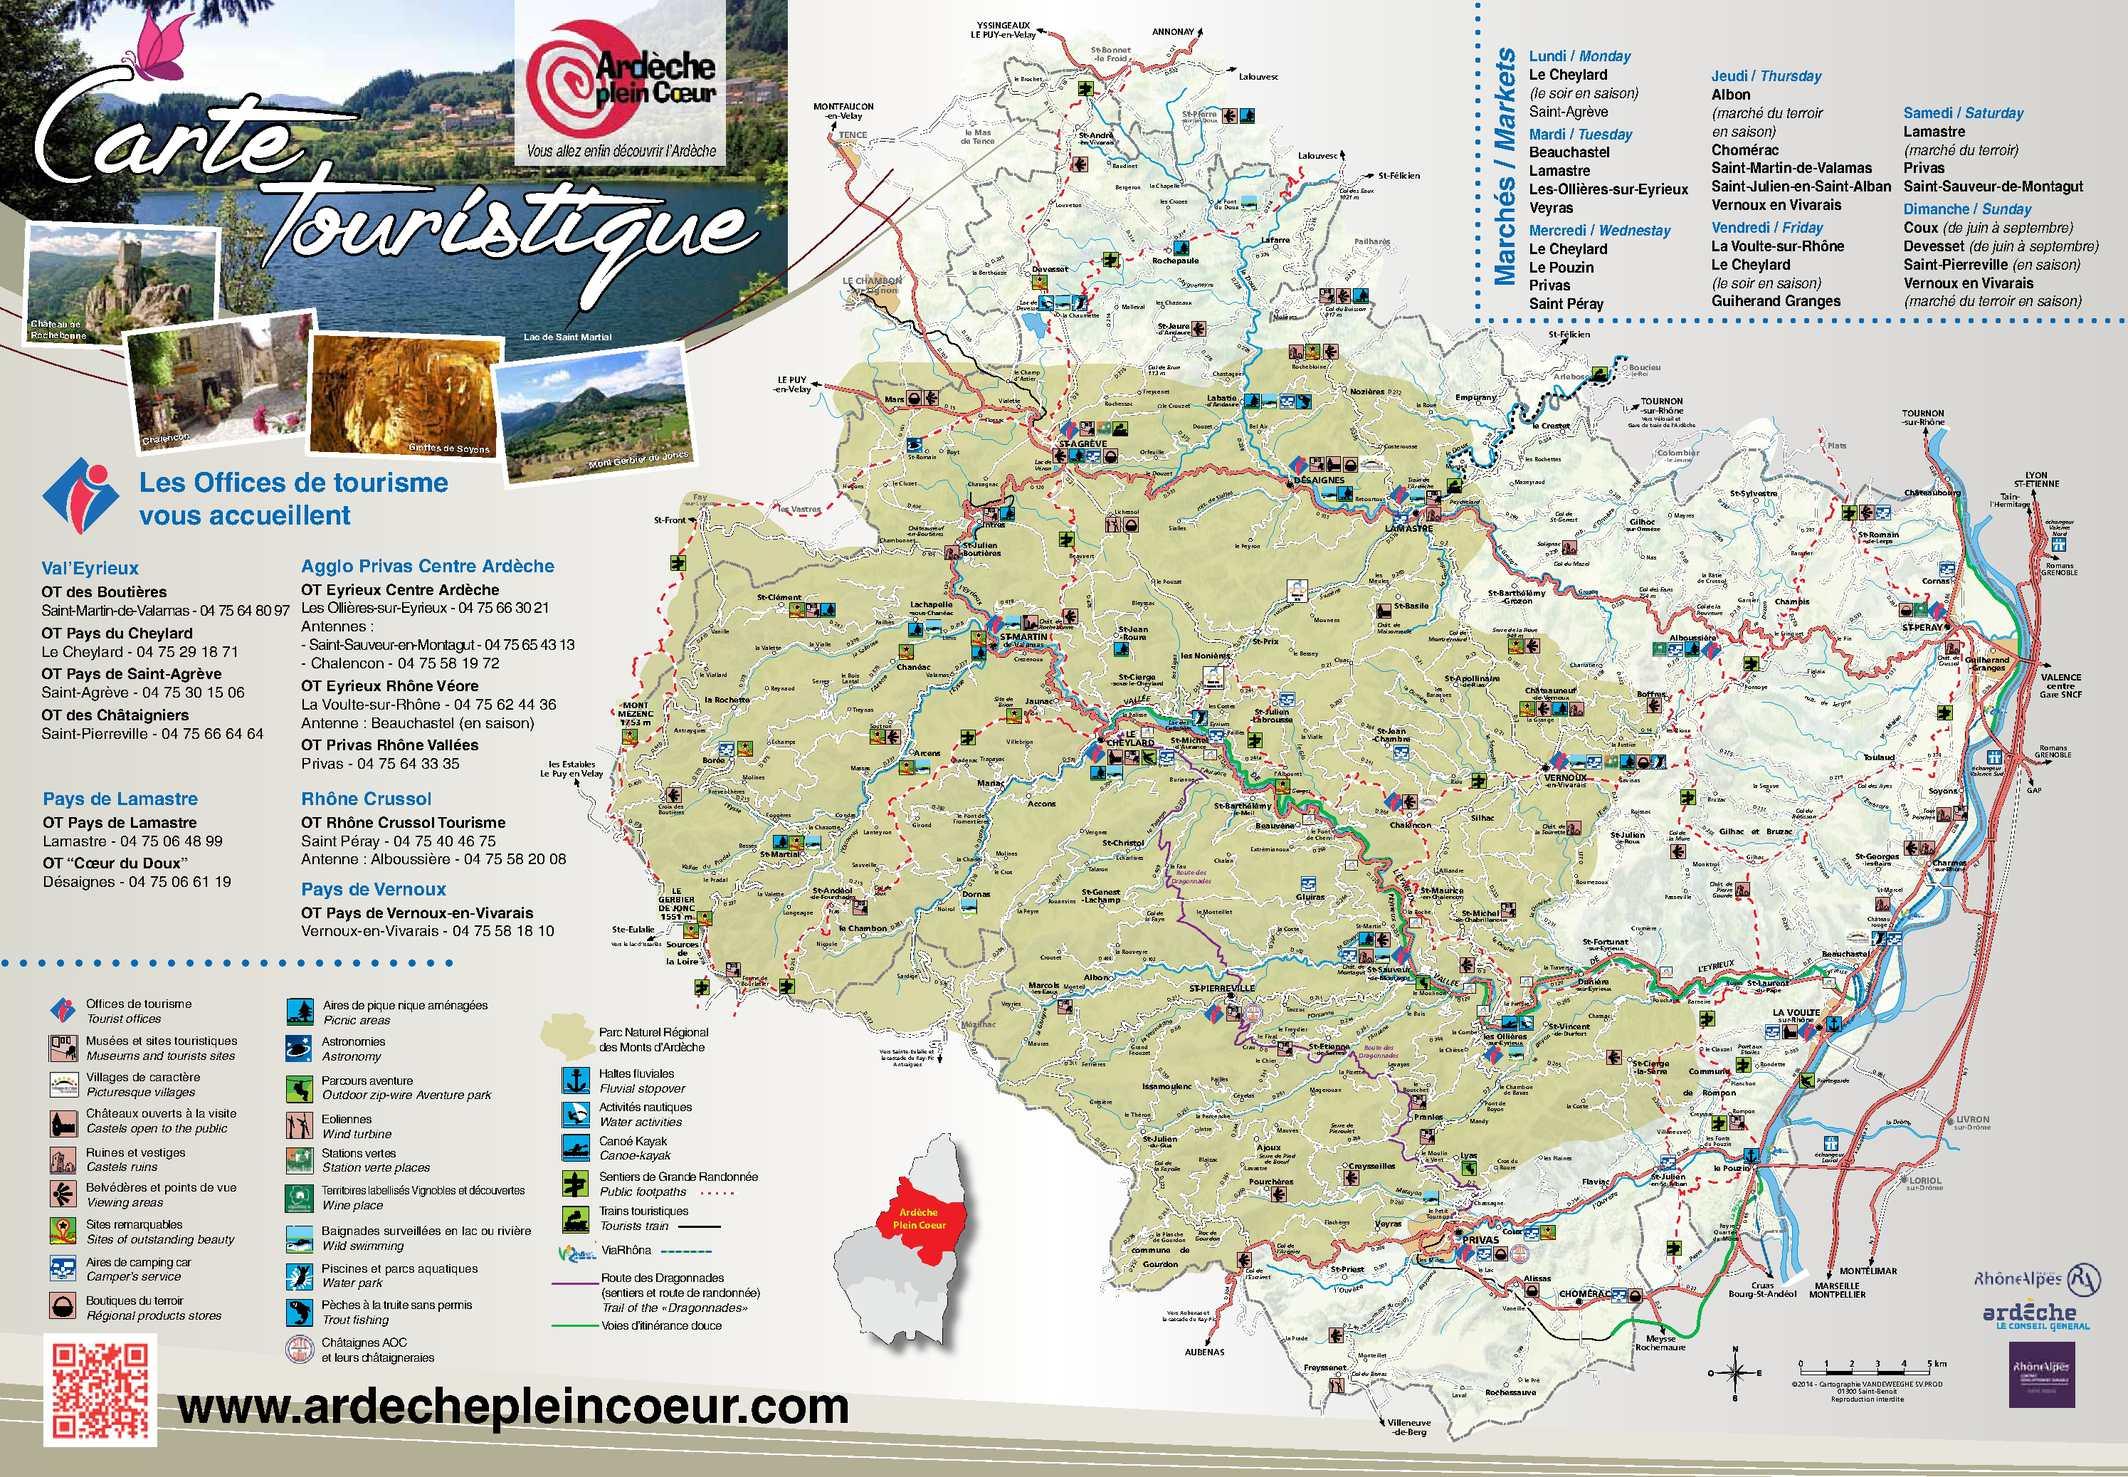 Calam o carte touristique ardeche plein coeur2015 - Office tourisme saint martin d ardeche ...